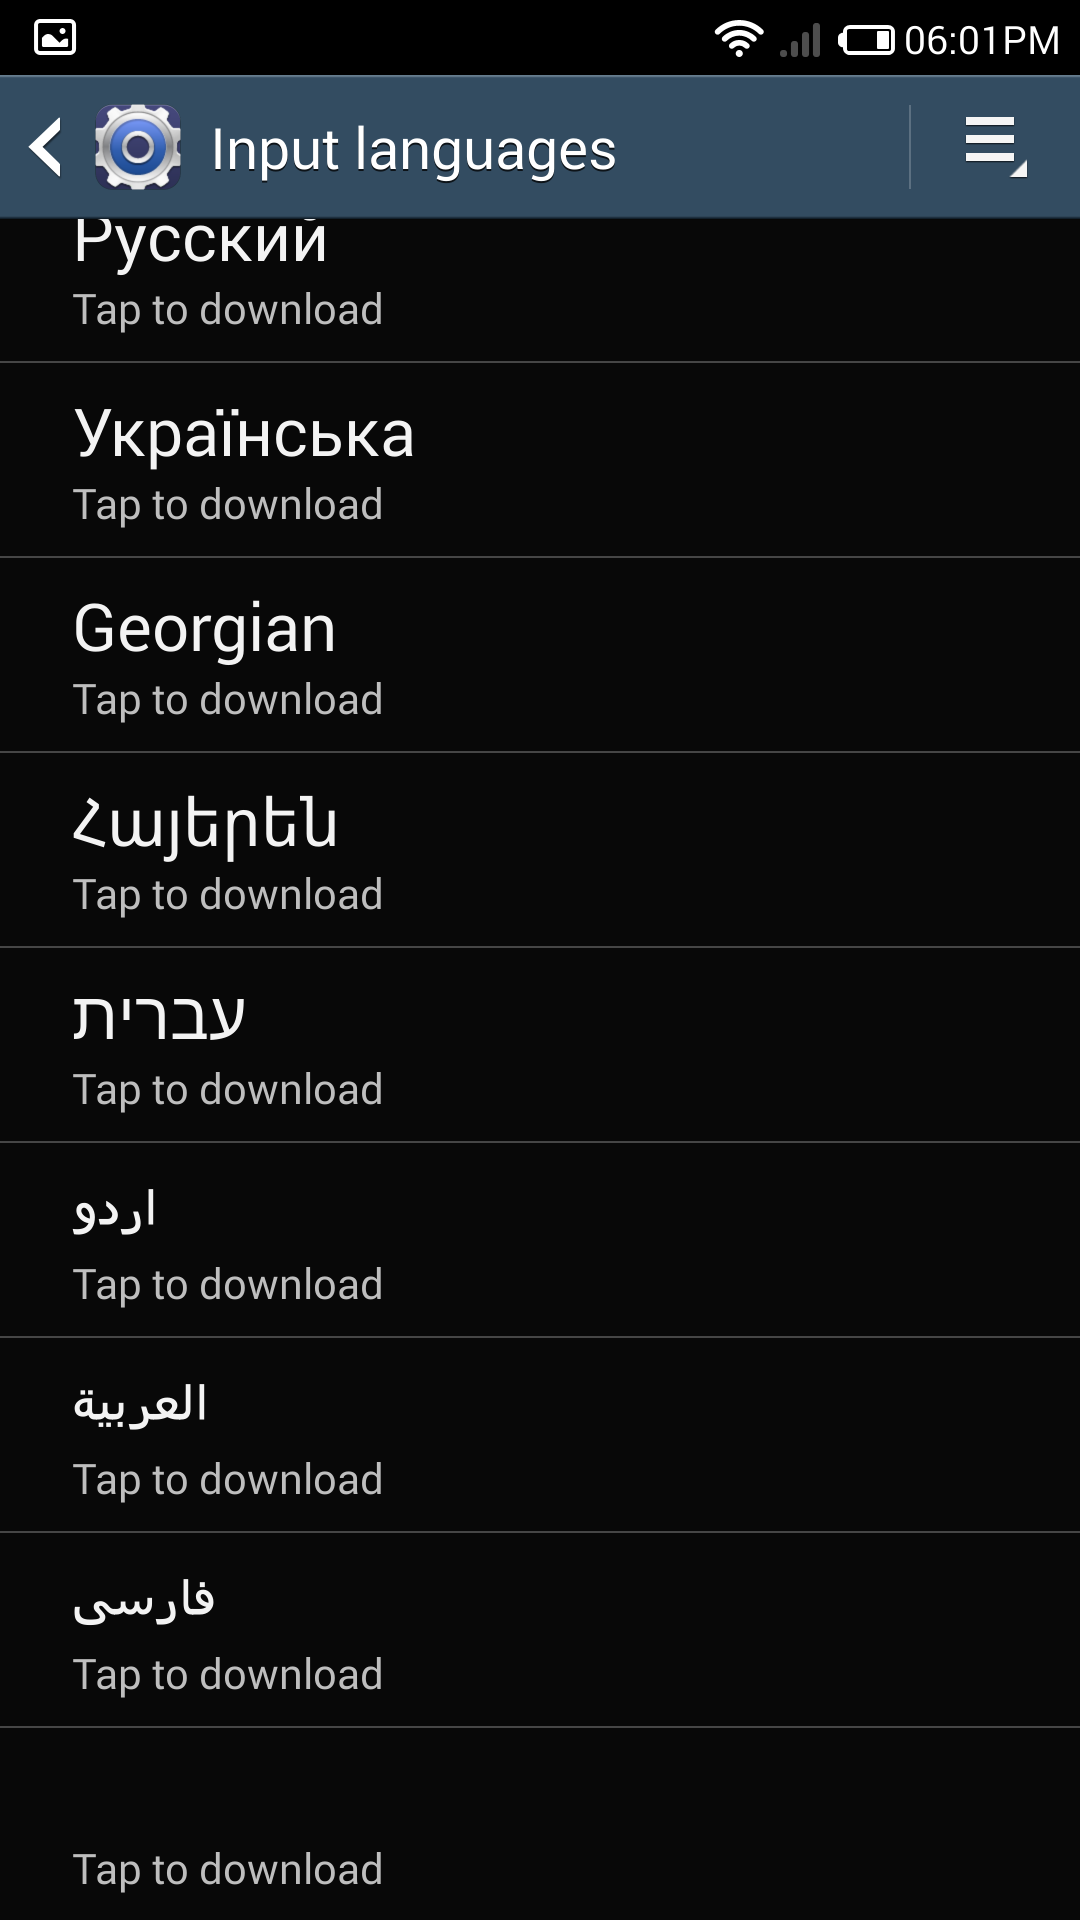 Screenshot_2014-04-06-18-01-05.png